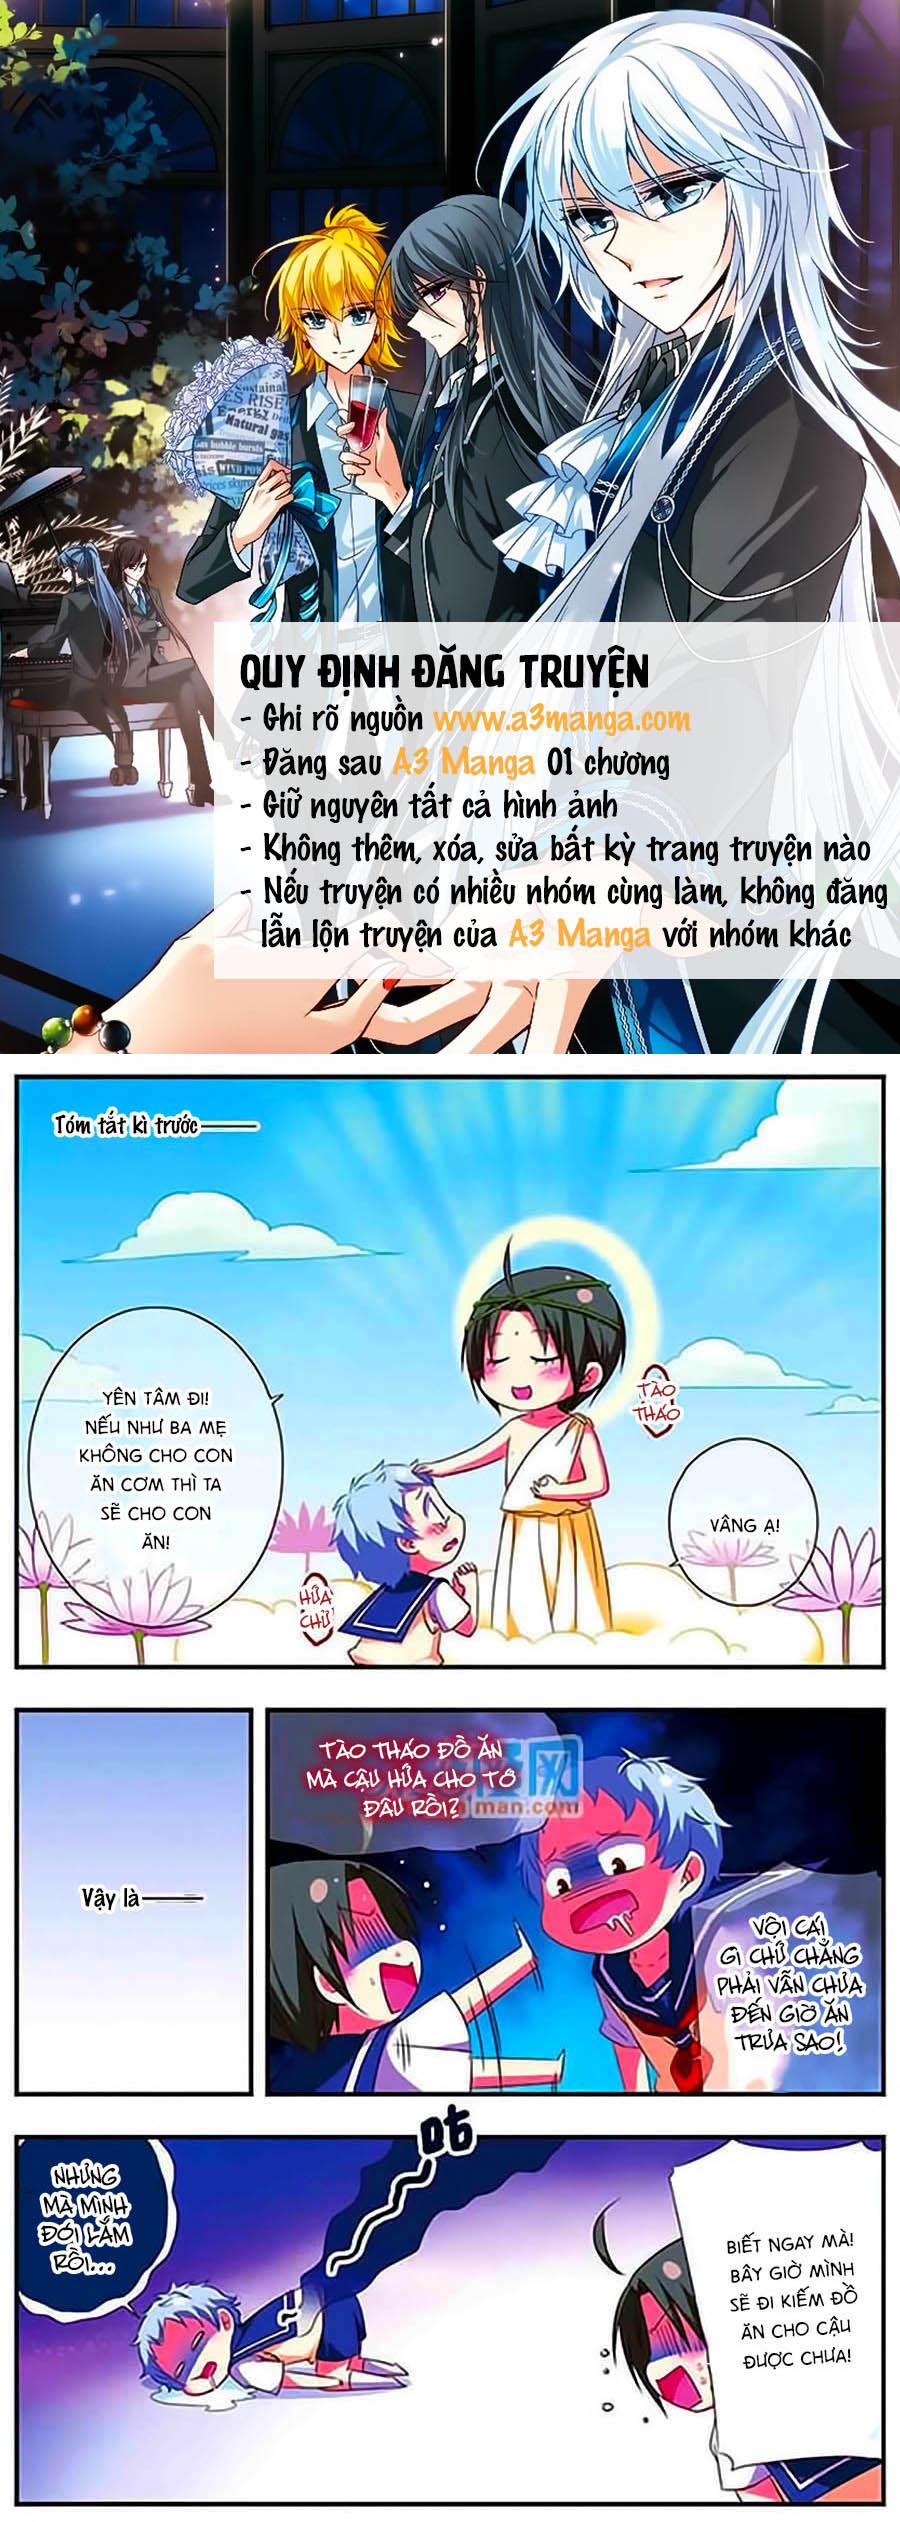 Manh Tam Quốc Chap 101 - Next Chap 102